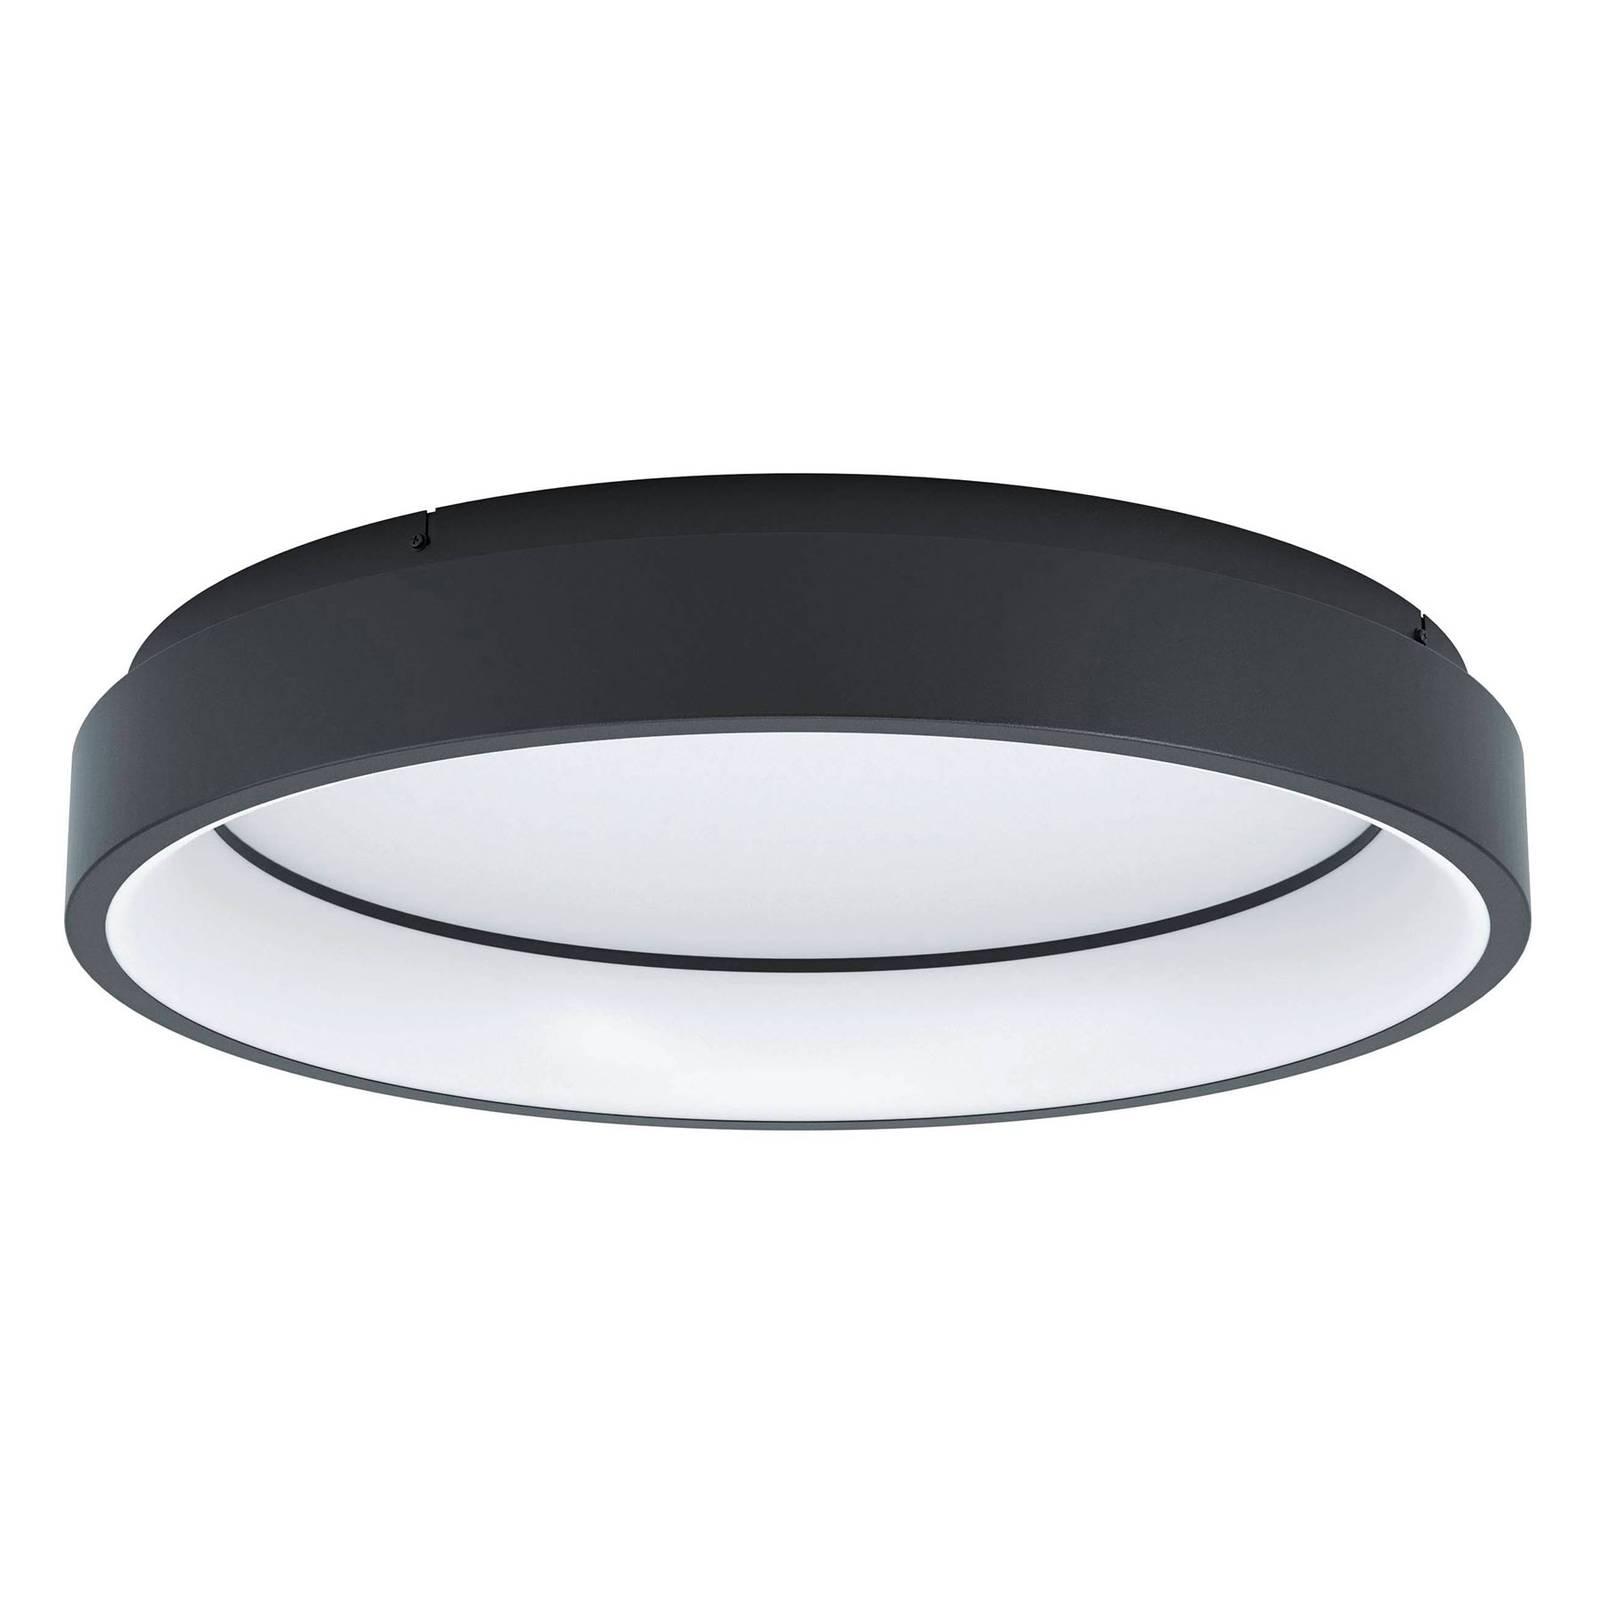 EGLO connect Marghera-C LED-Deckenleuchte